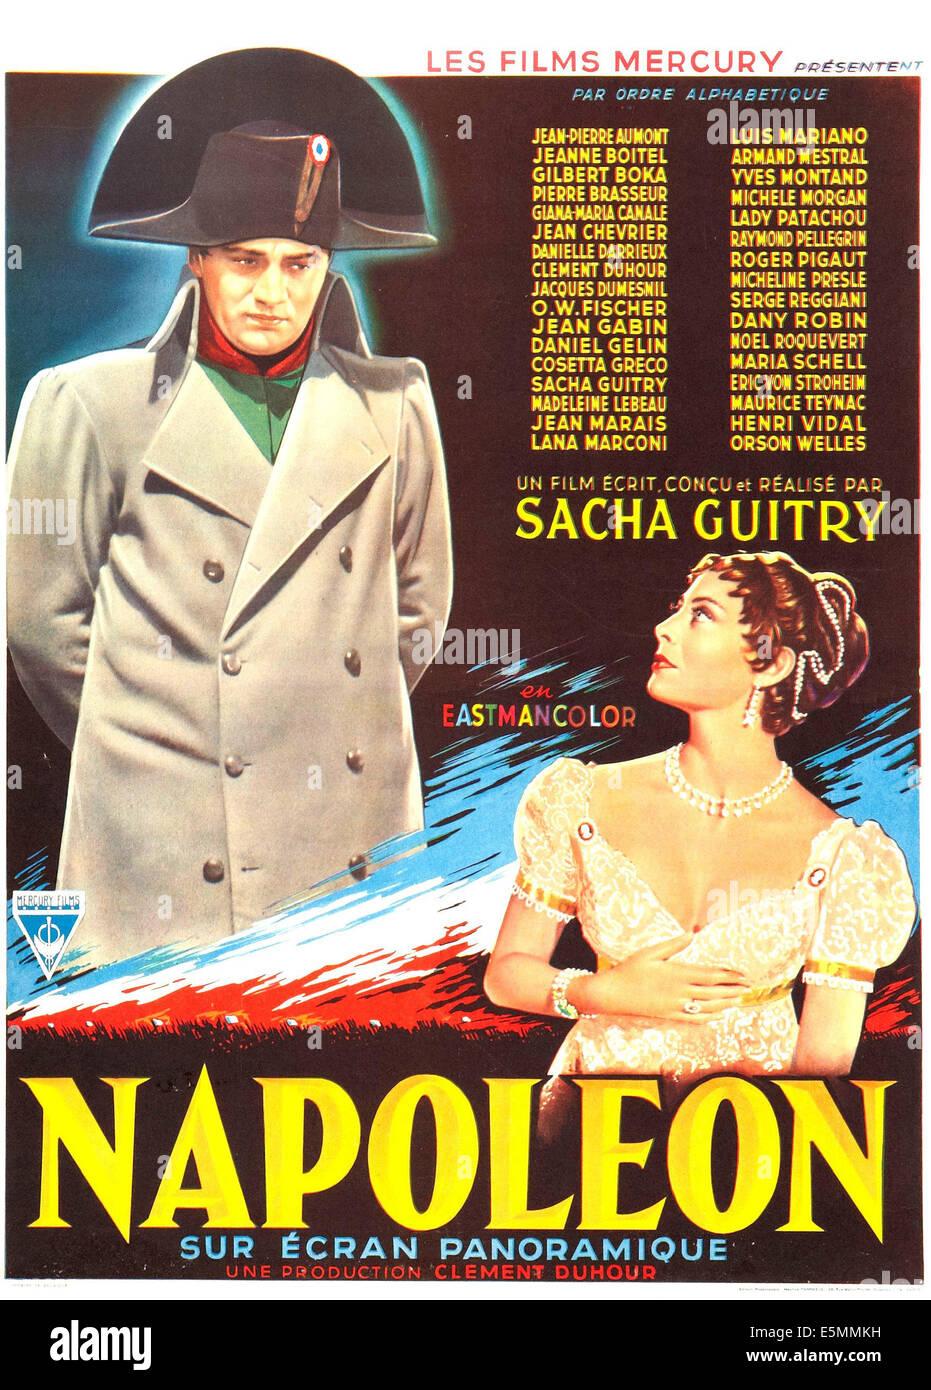 NAPOLEON, US poster art 1955. - Stock Image